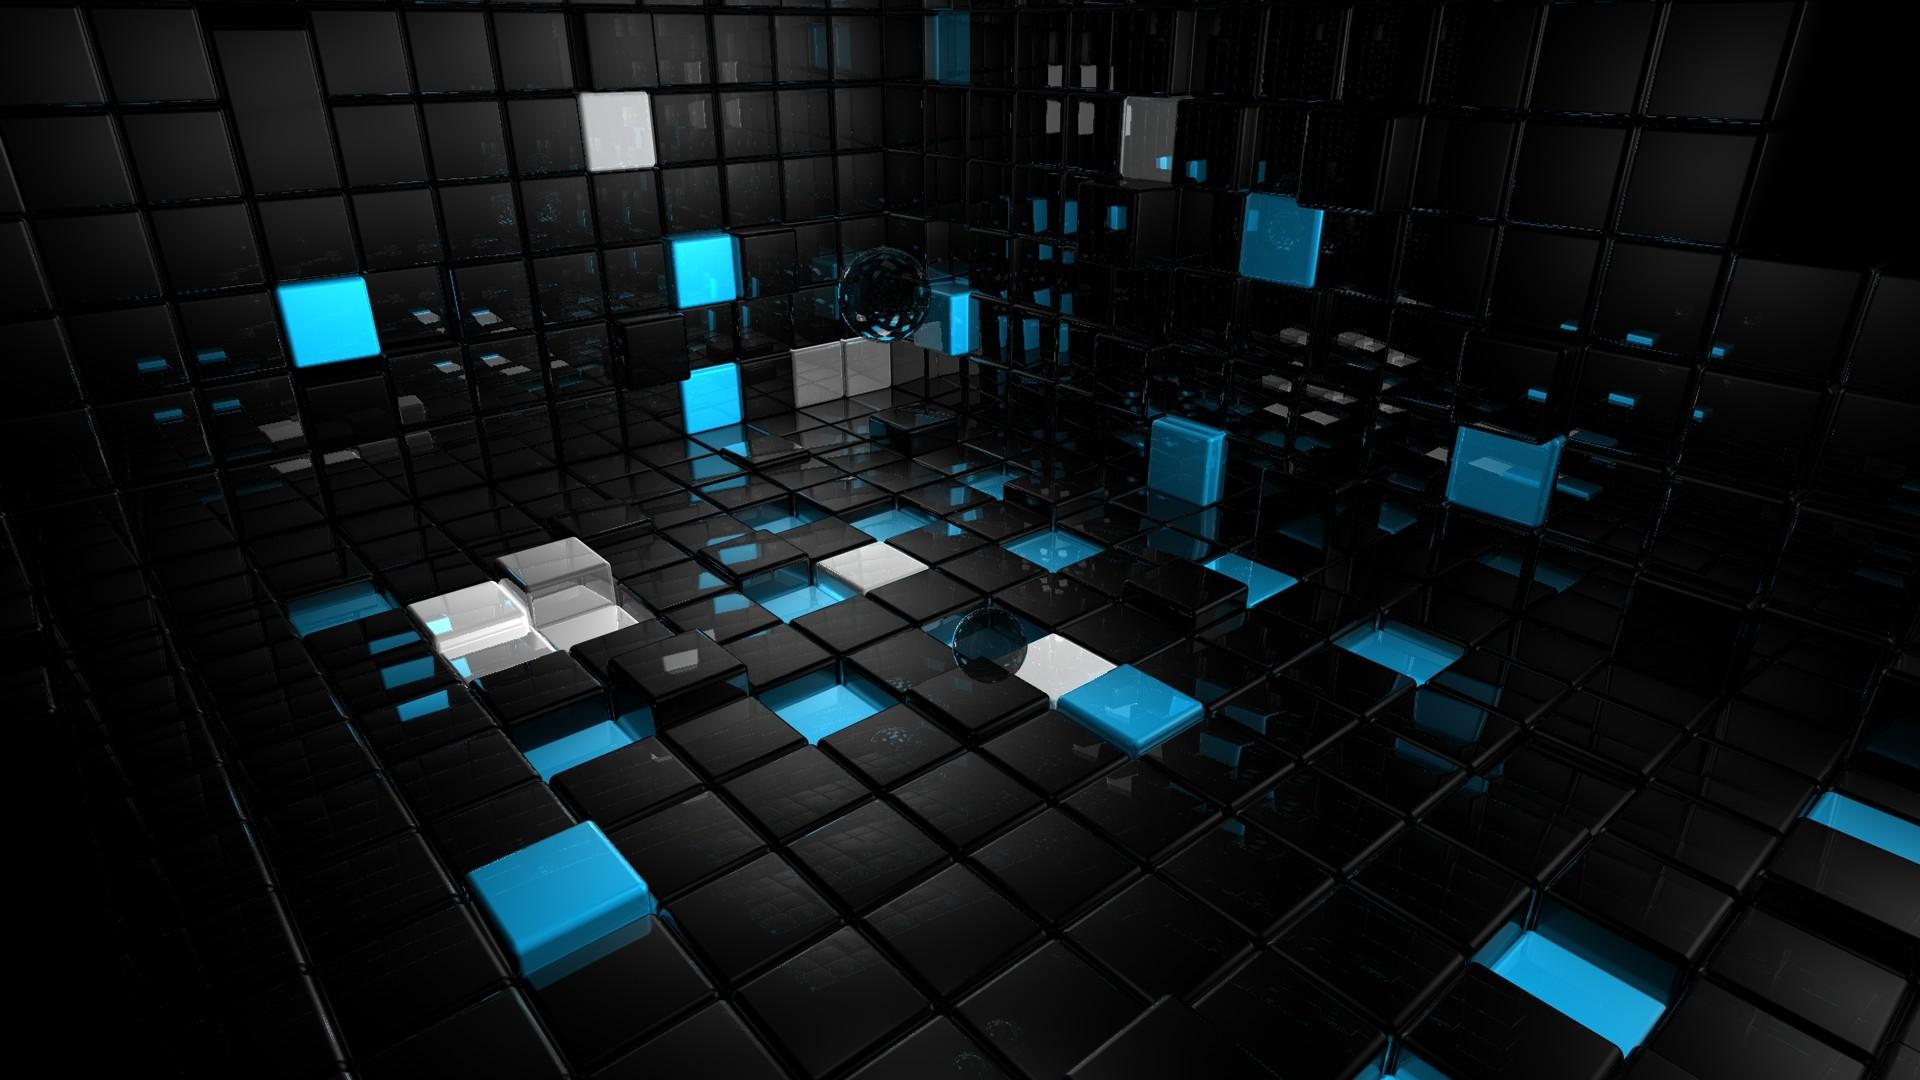 3D Cube Wallpaper (80+ Images